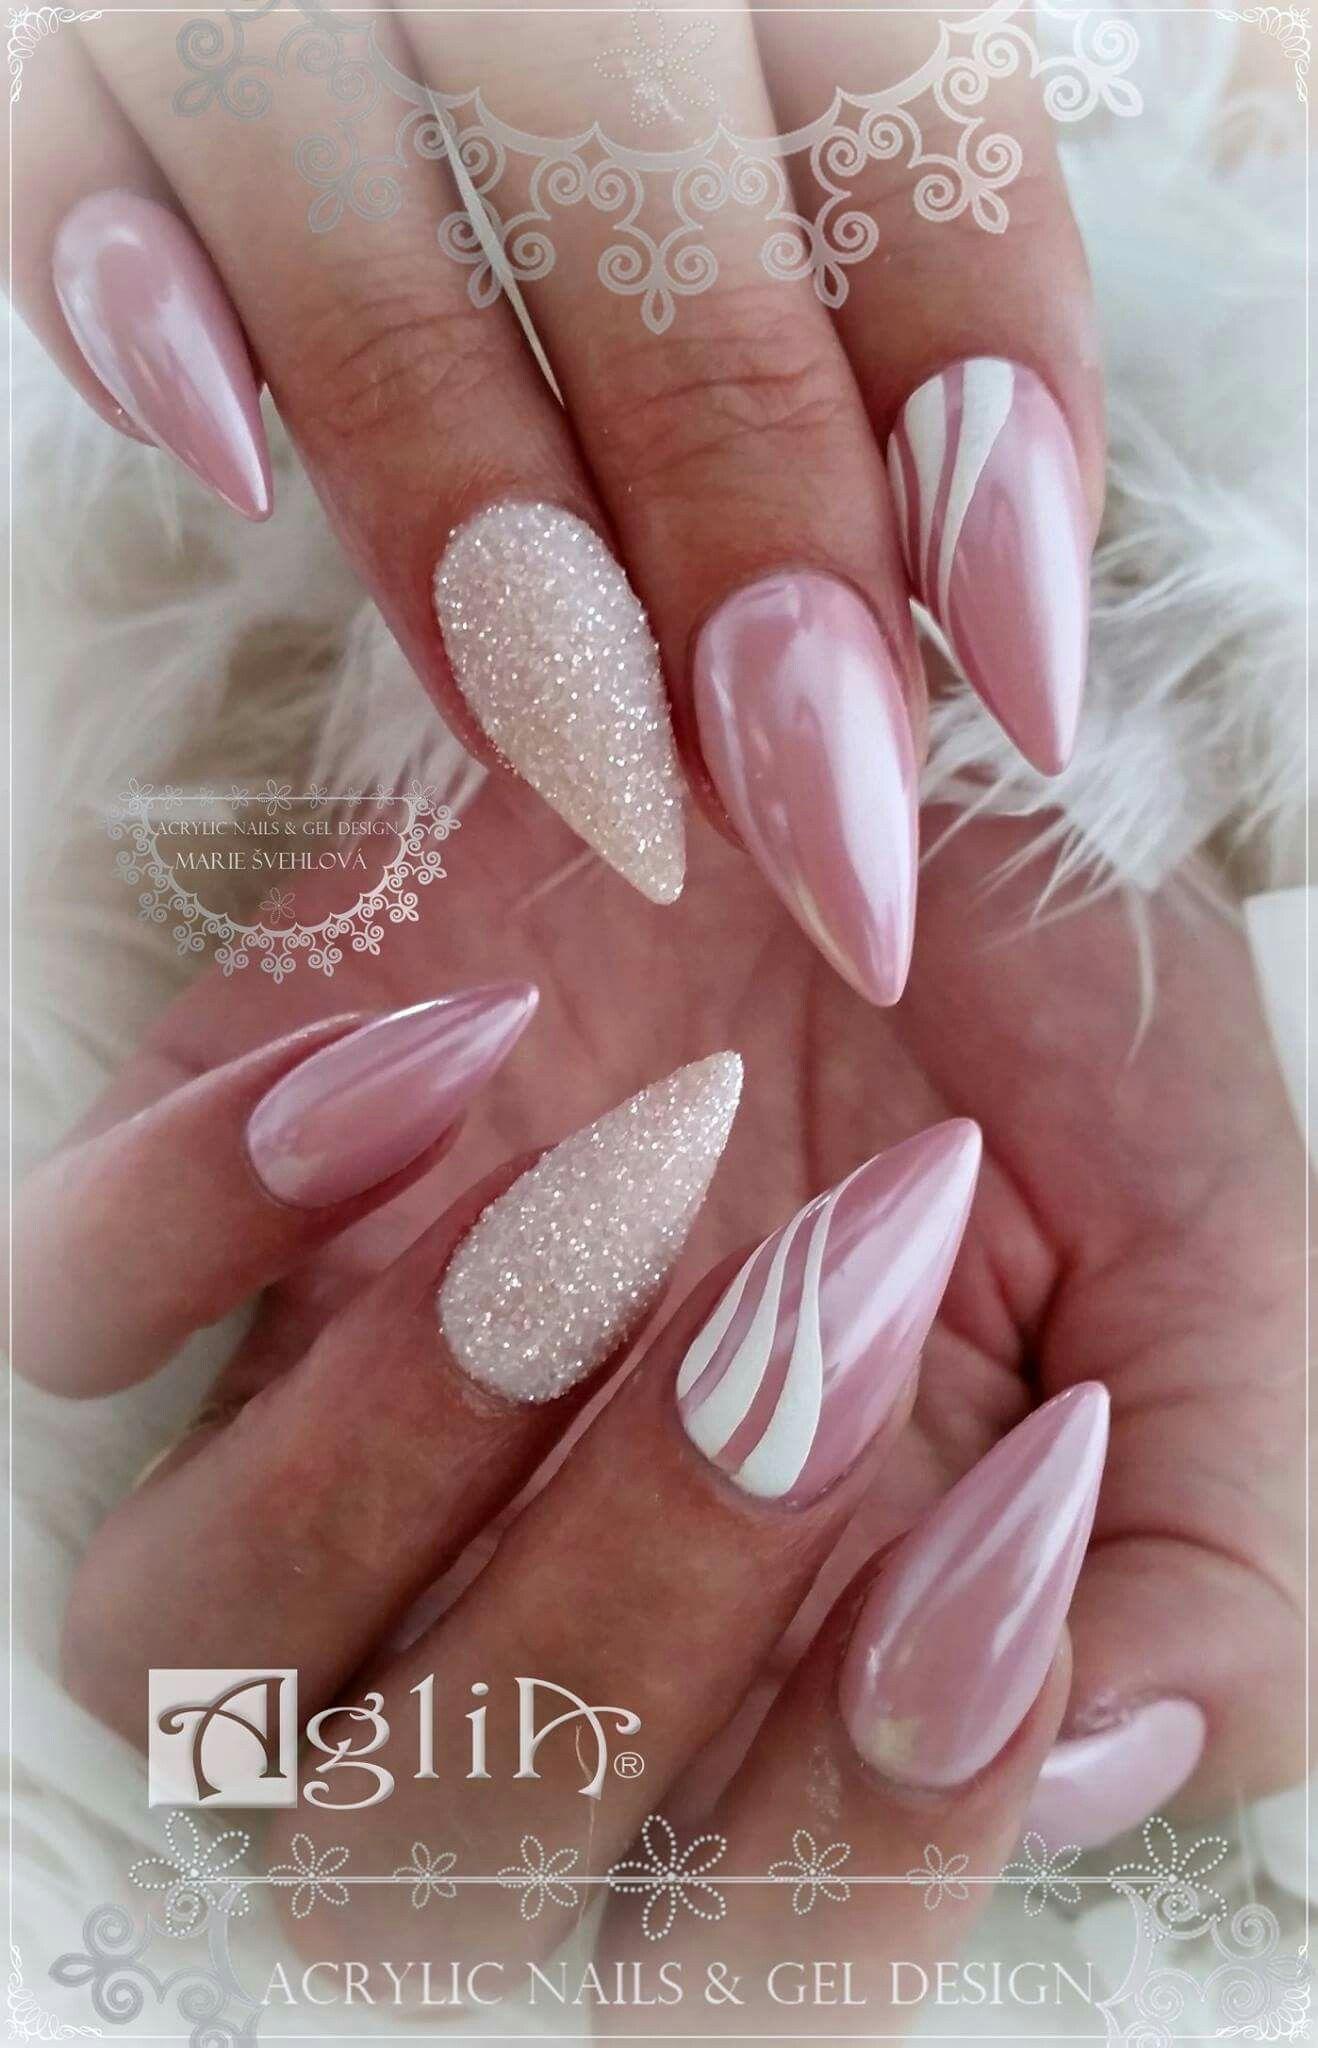 Acrylic Mail S Gel Design Chrome White Nails Ruzove Nechty Ombre Nechty Nechtovy Dizajn